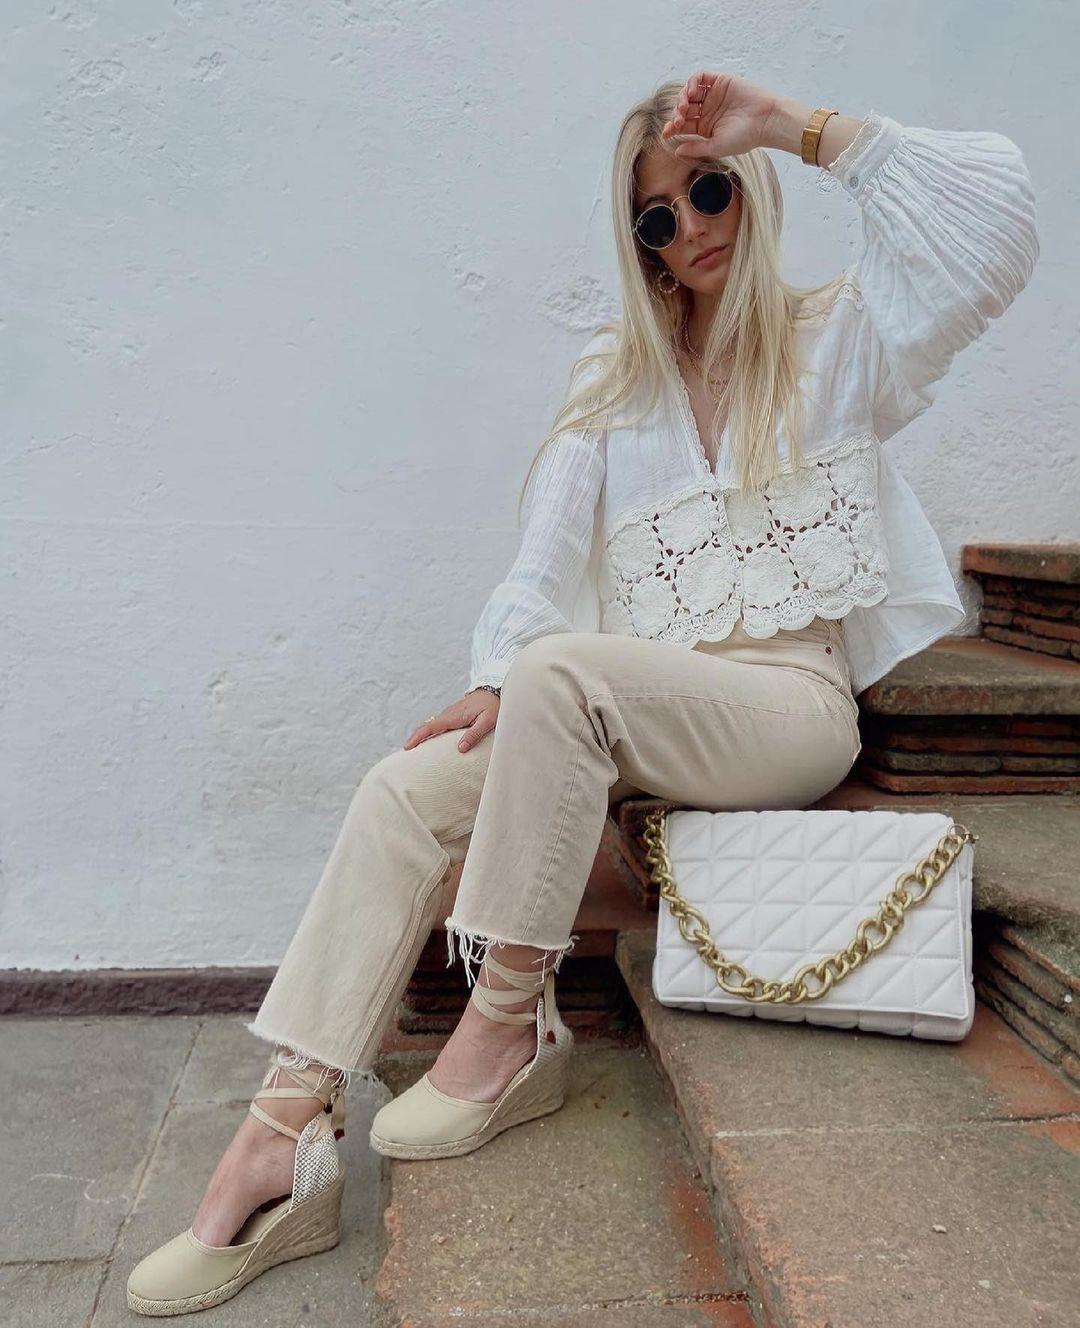 quilted shoulder bag with chain de Zara sur zaradiccion__